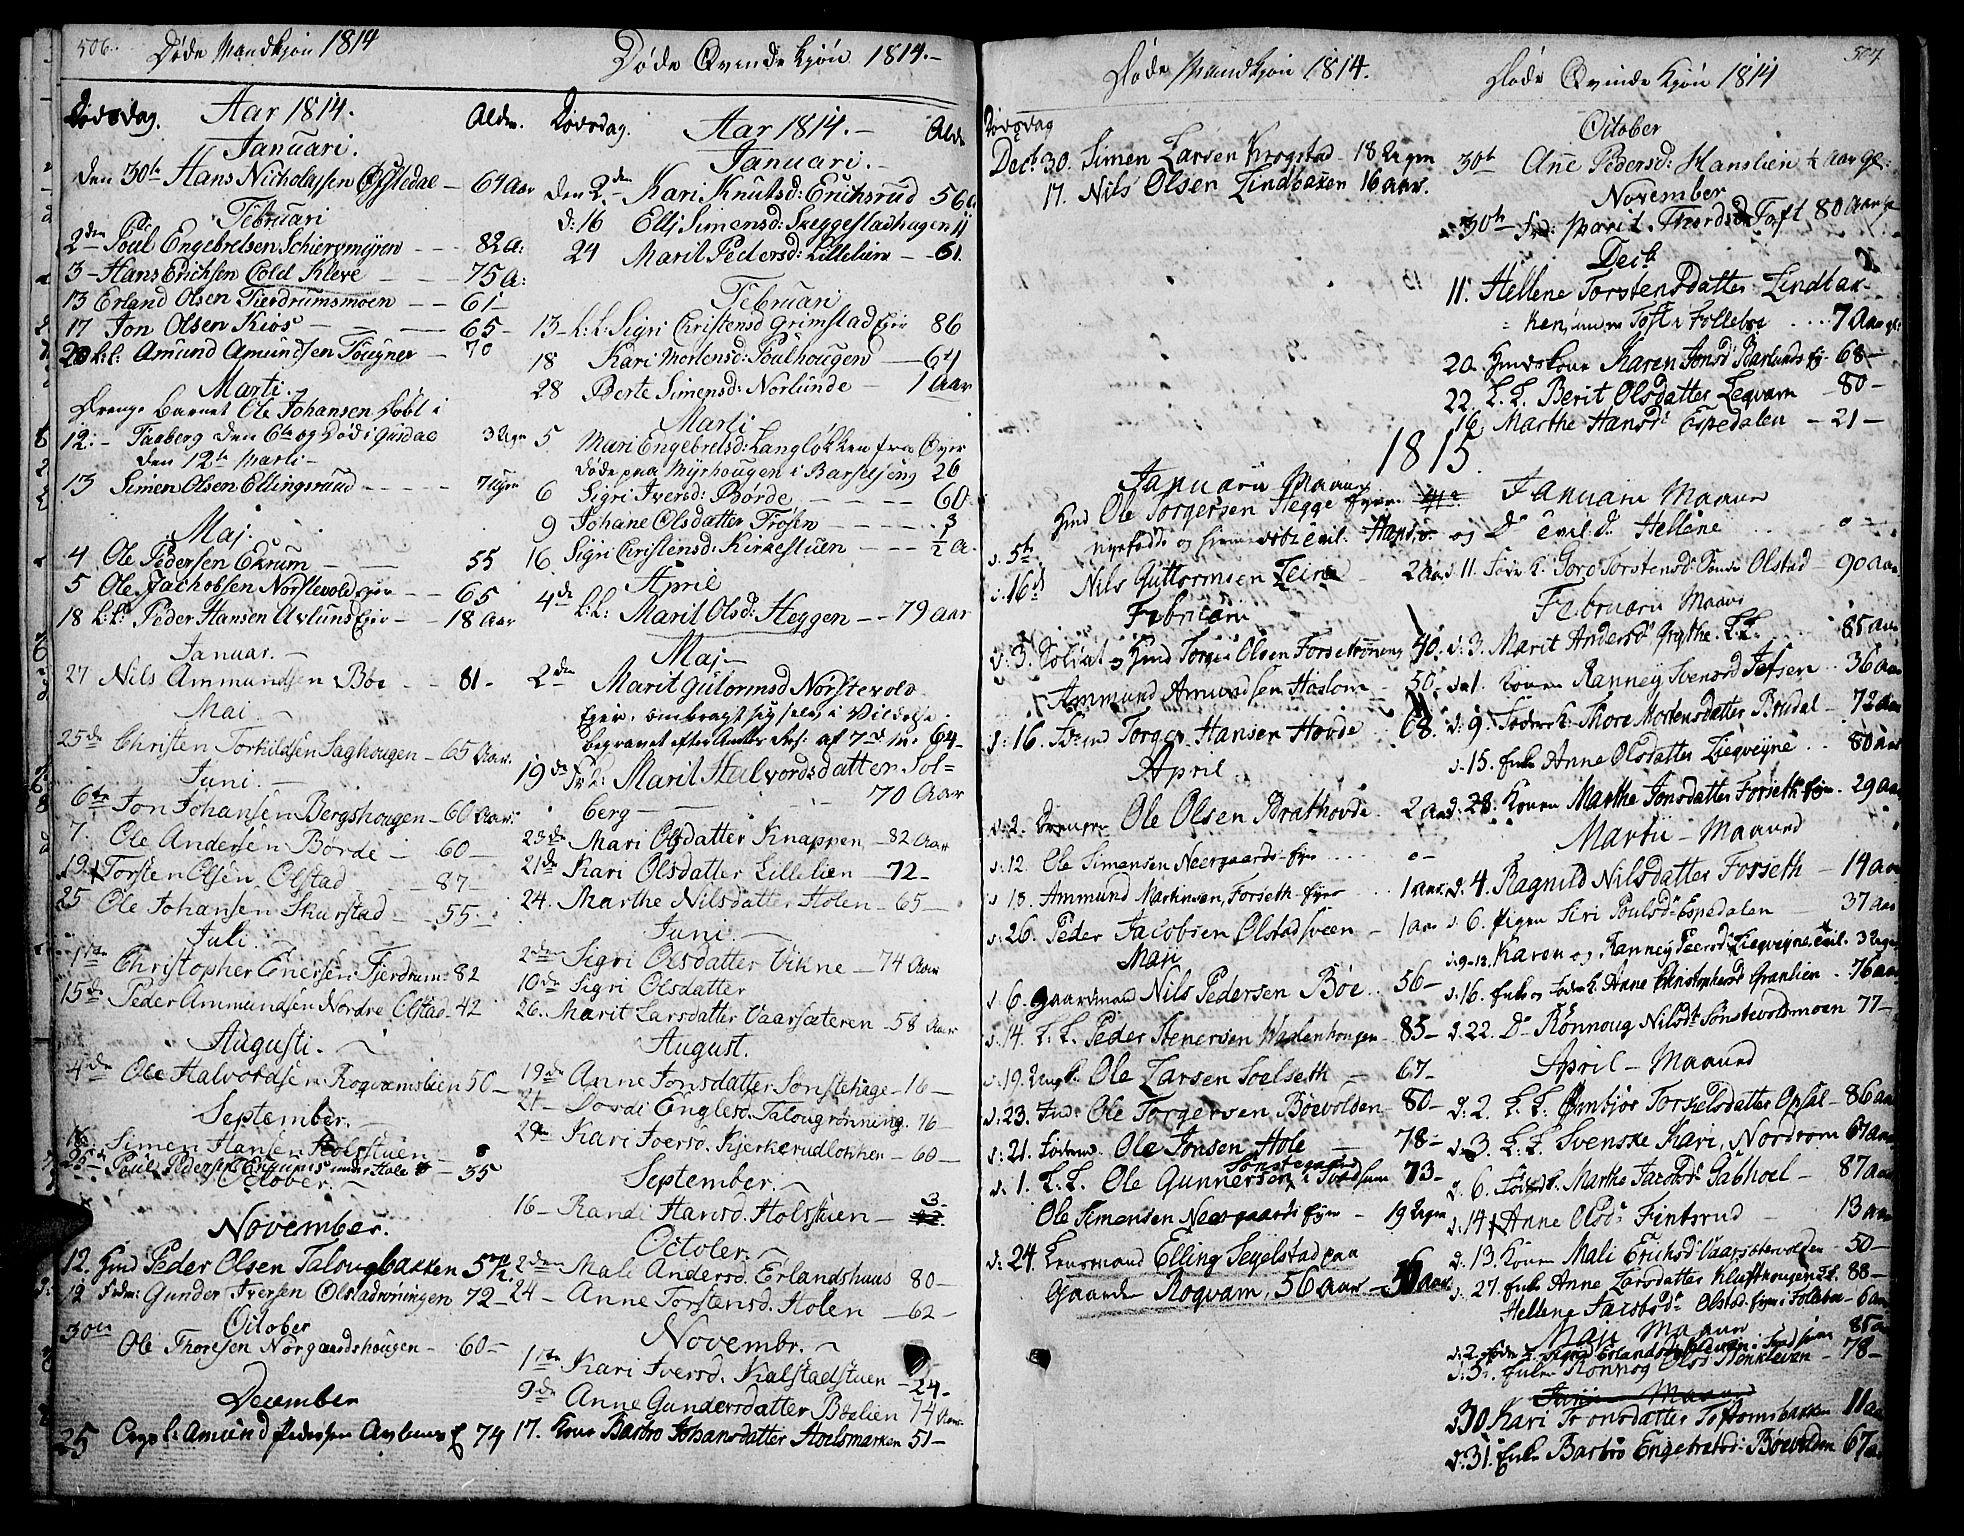 SAH, Gausdal prestekontor, Ministerialbok nr. 4, 1809-1817, s. 506-507